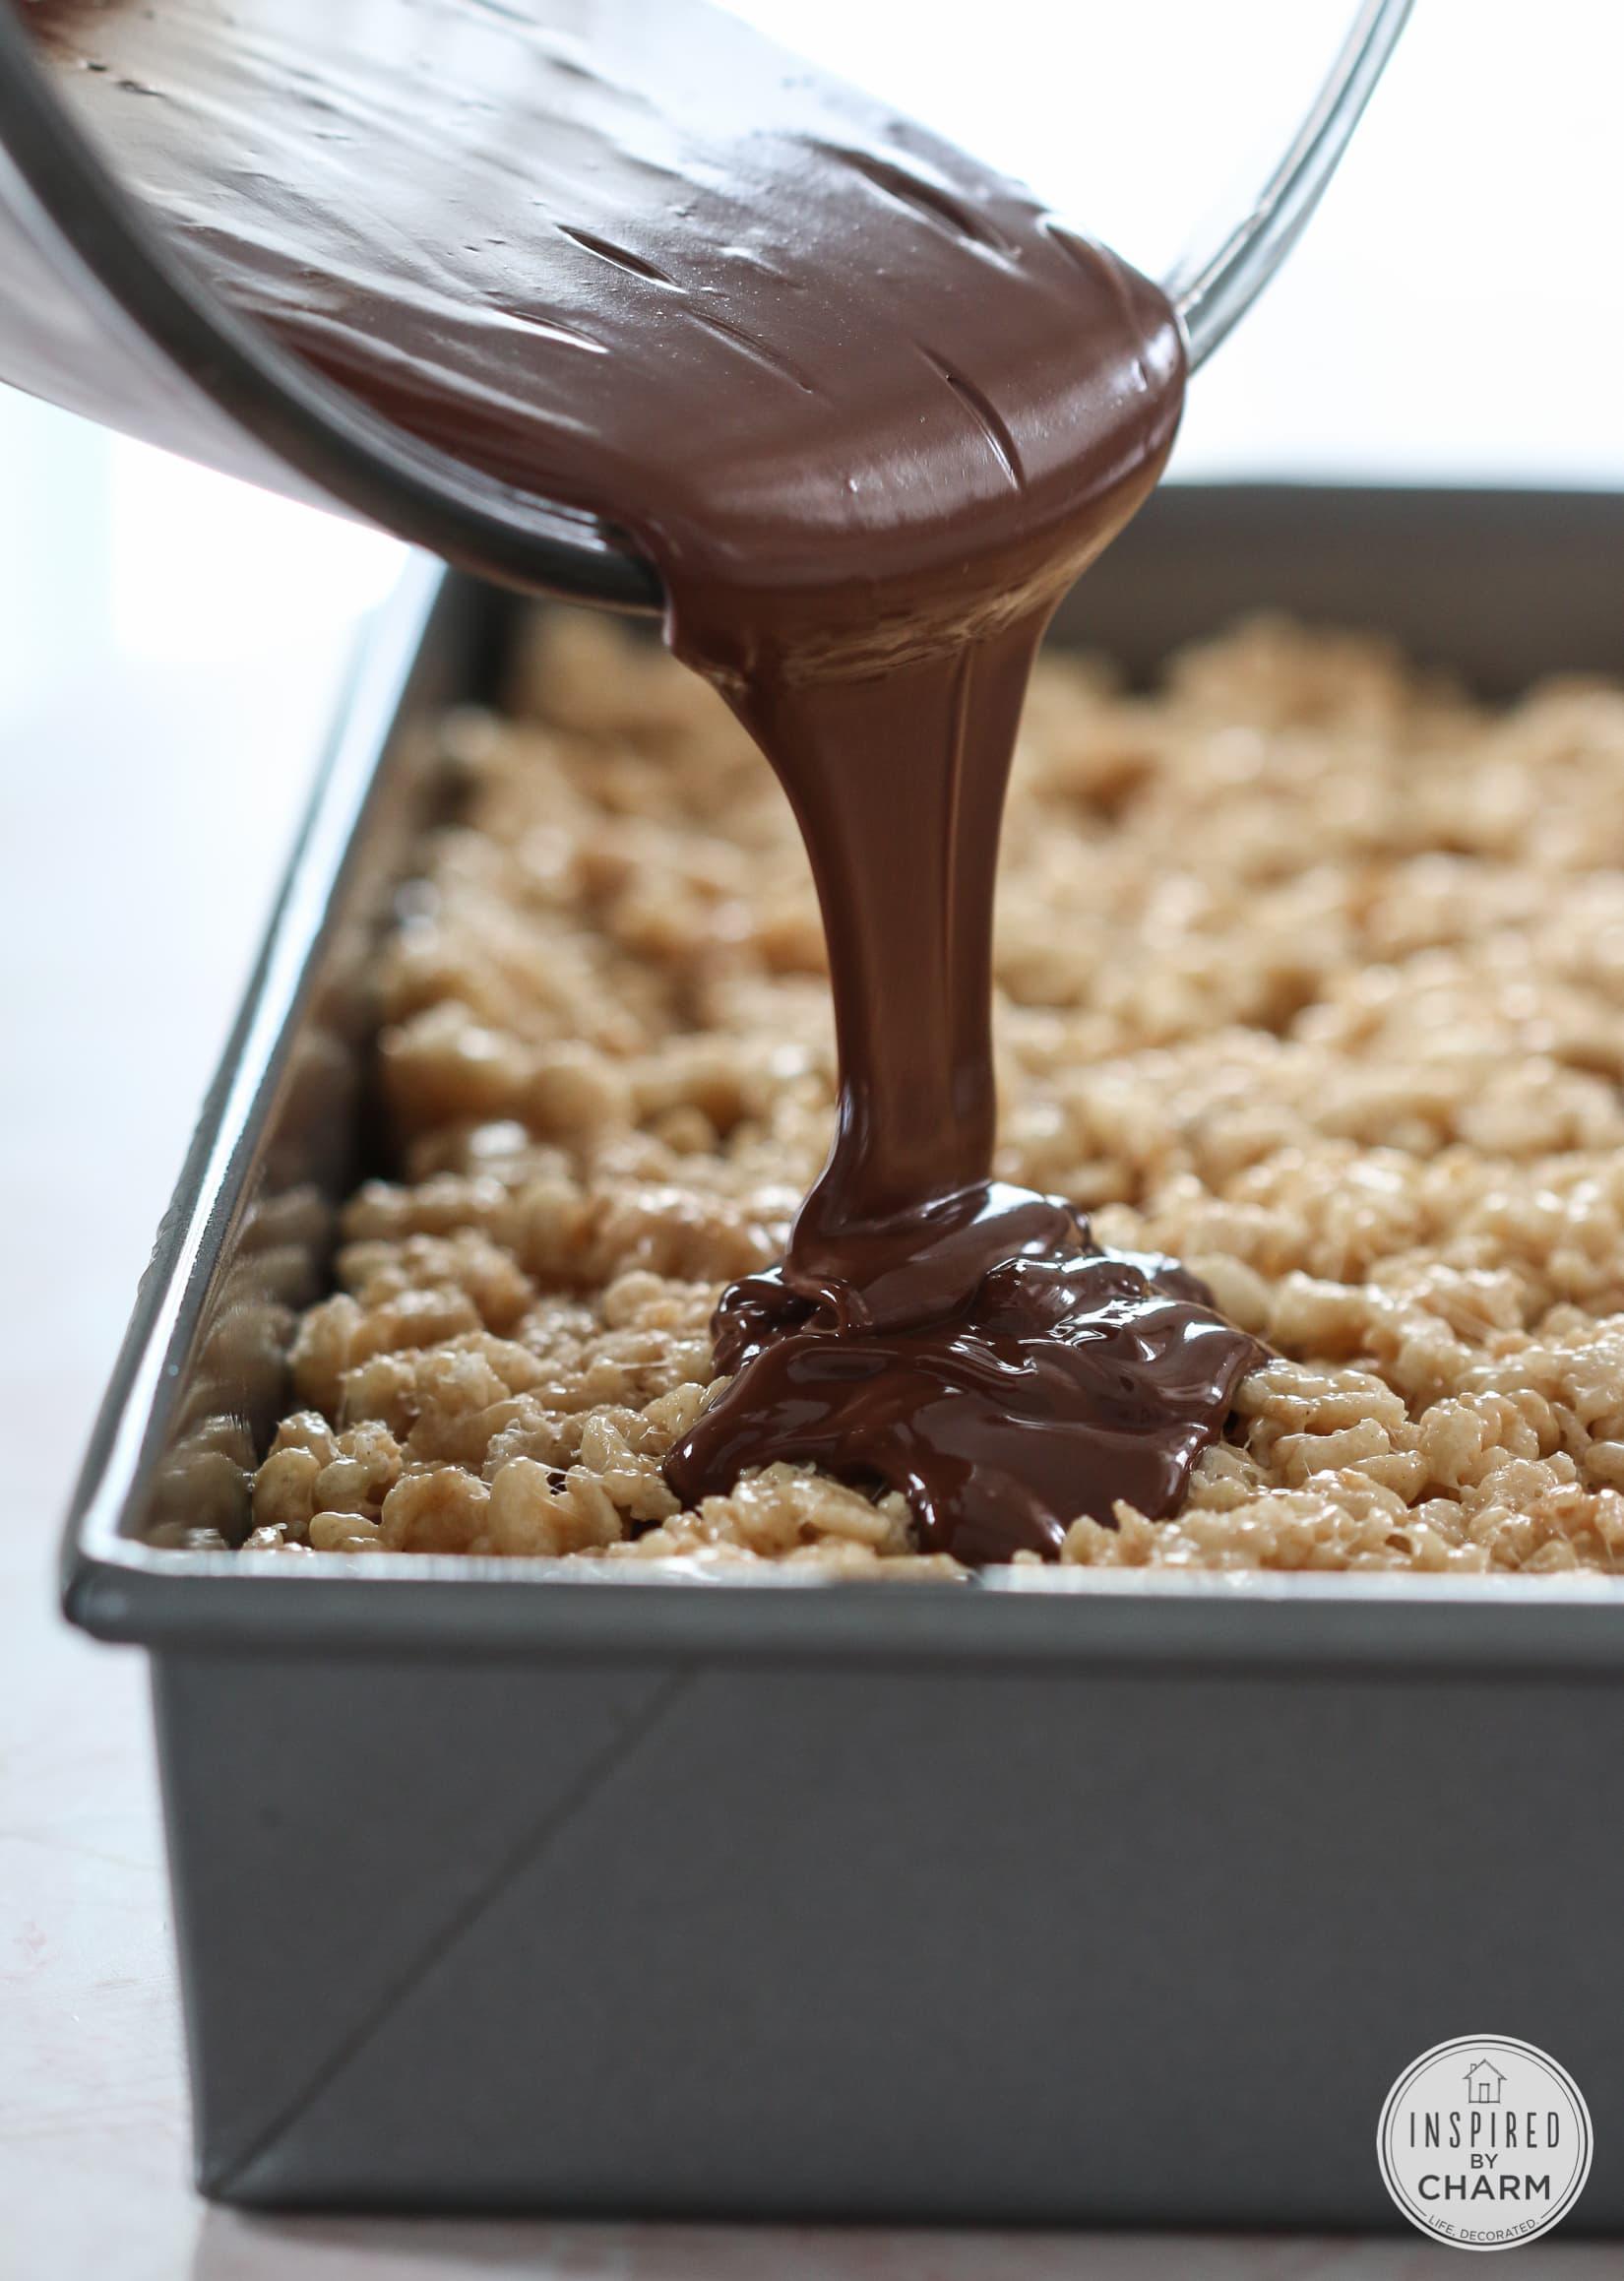 ... Peanut Butter Cup Rice Krispie Treats that I made last week. In